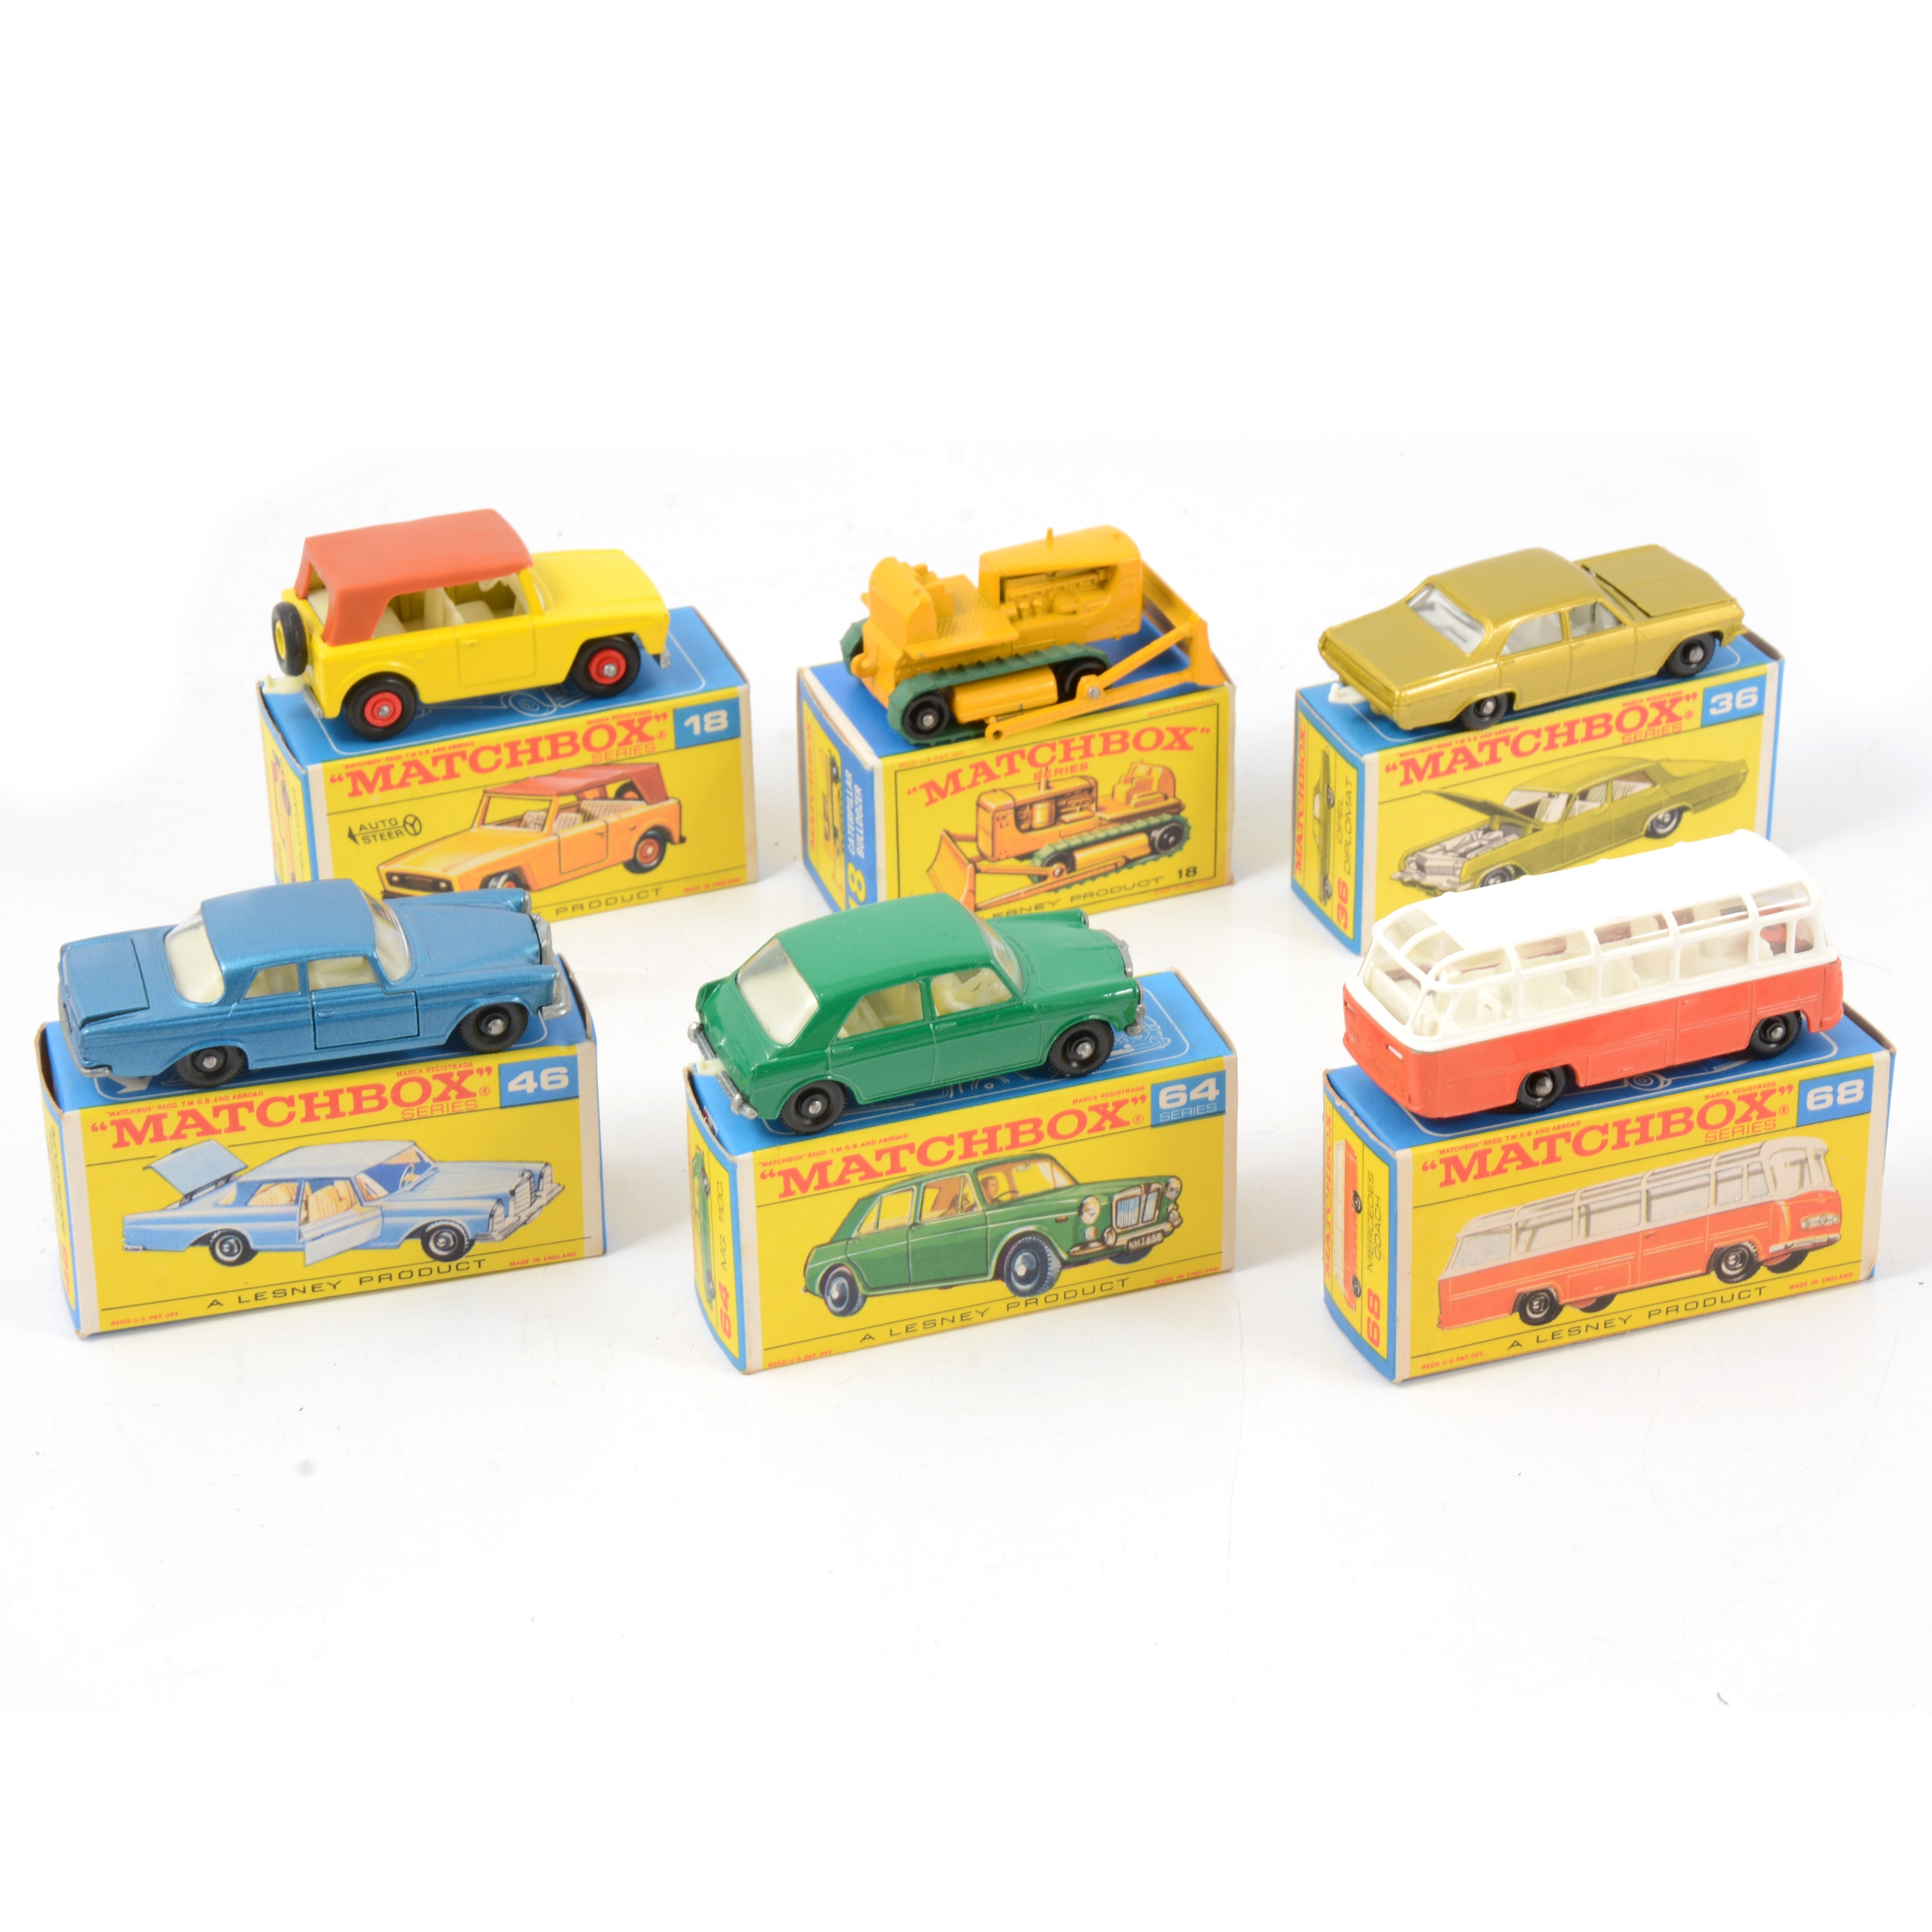 Matchbox Lesney die-cast models; six including 18 field car. - Image 2 of 2